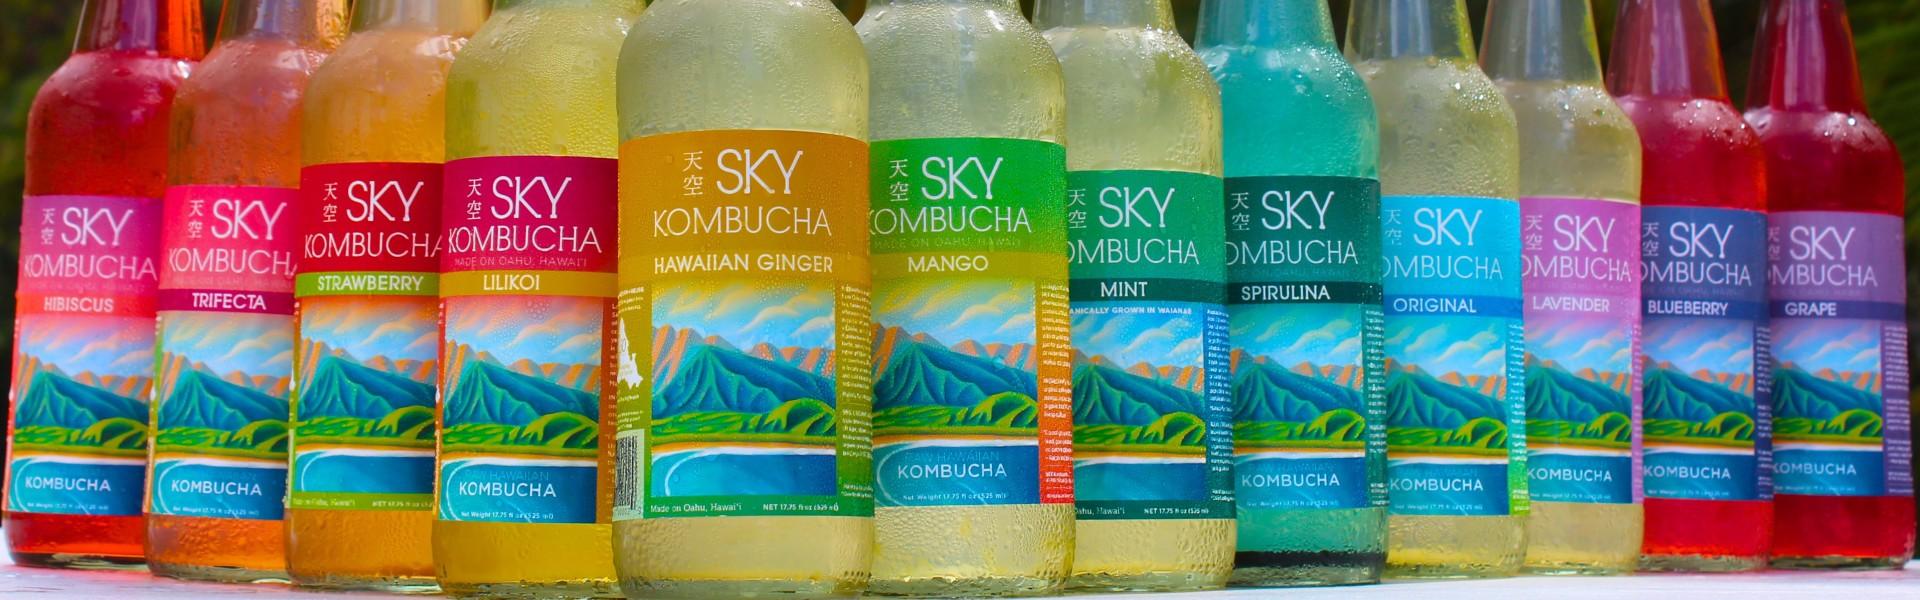 SKY Kombucha